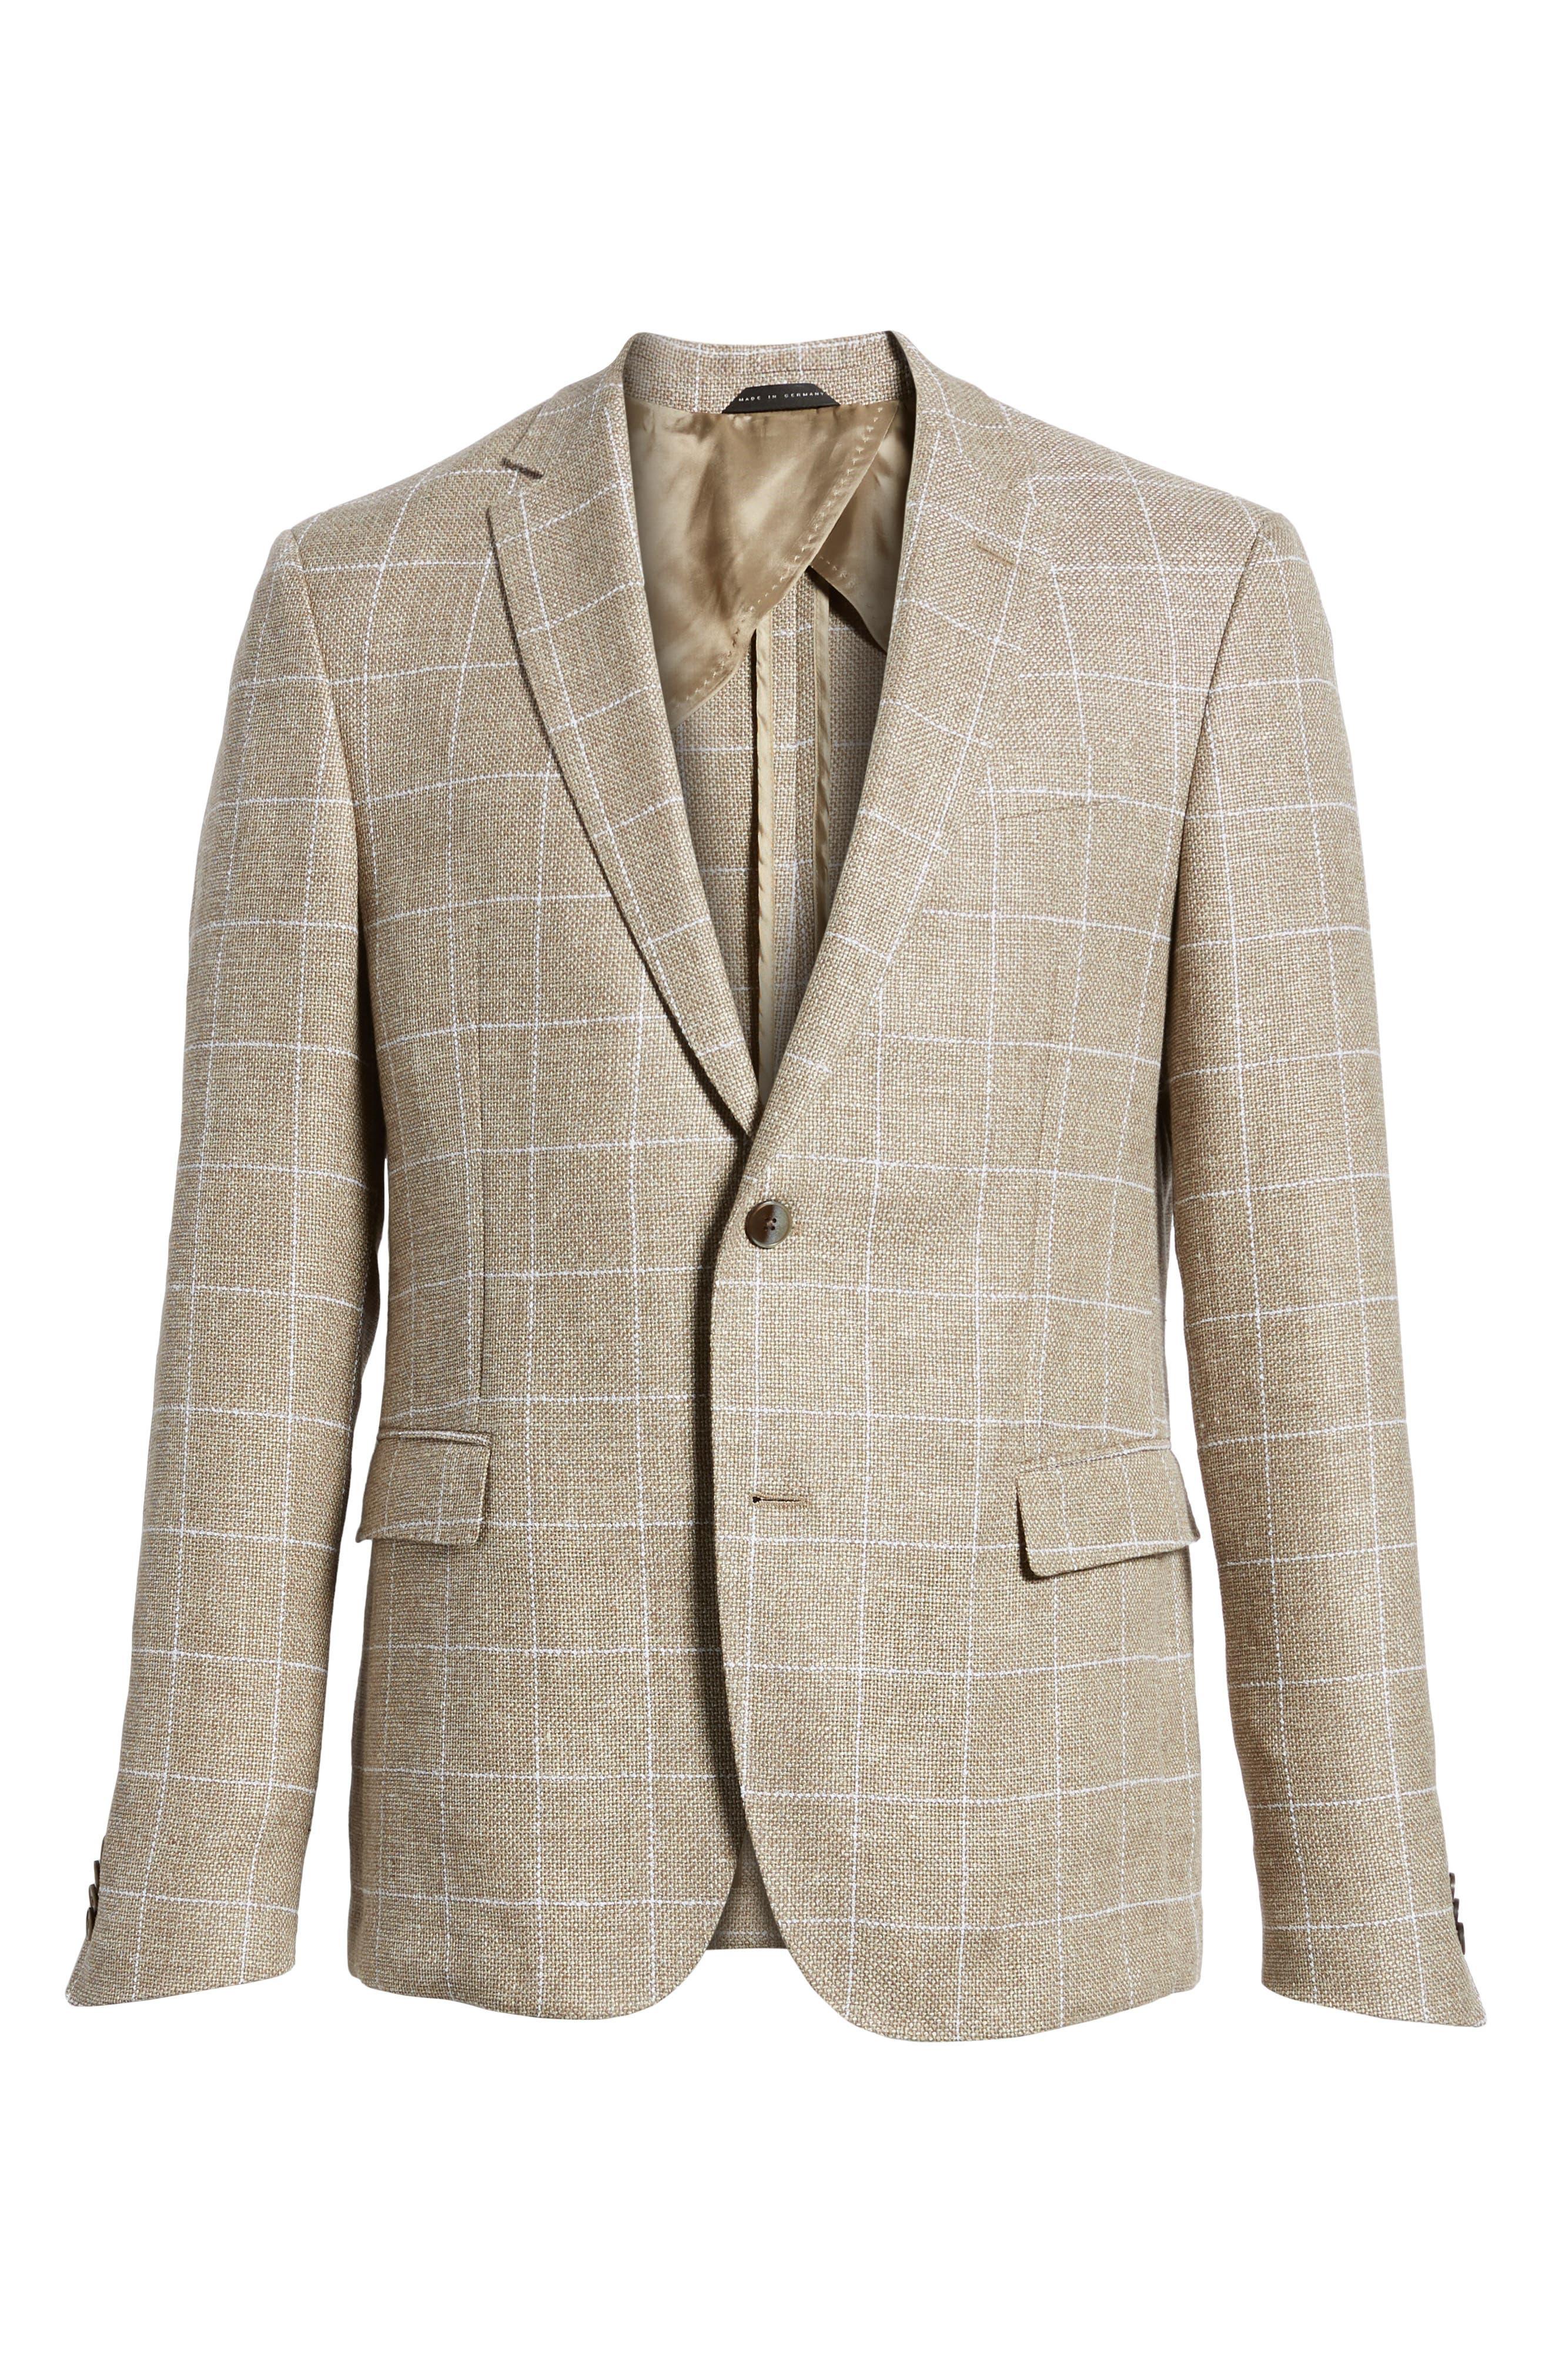 Nobis Trim Fit Windowpane Wool & Linen Sport Coat,                             Alternate thumbnail 5, color,                             250